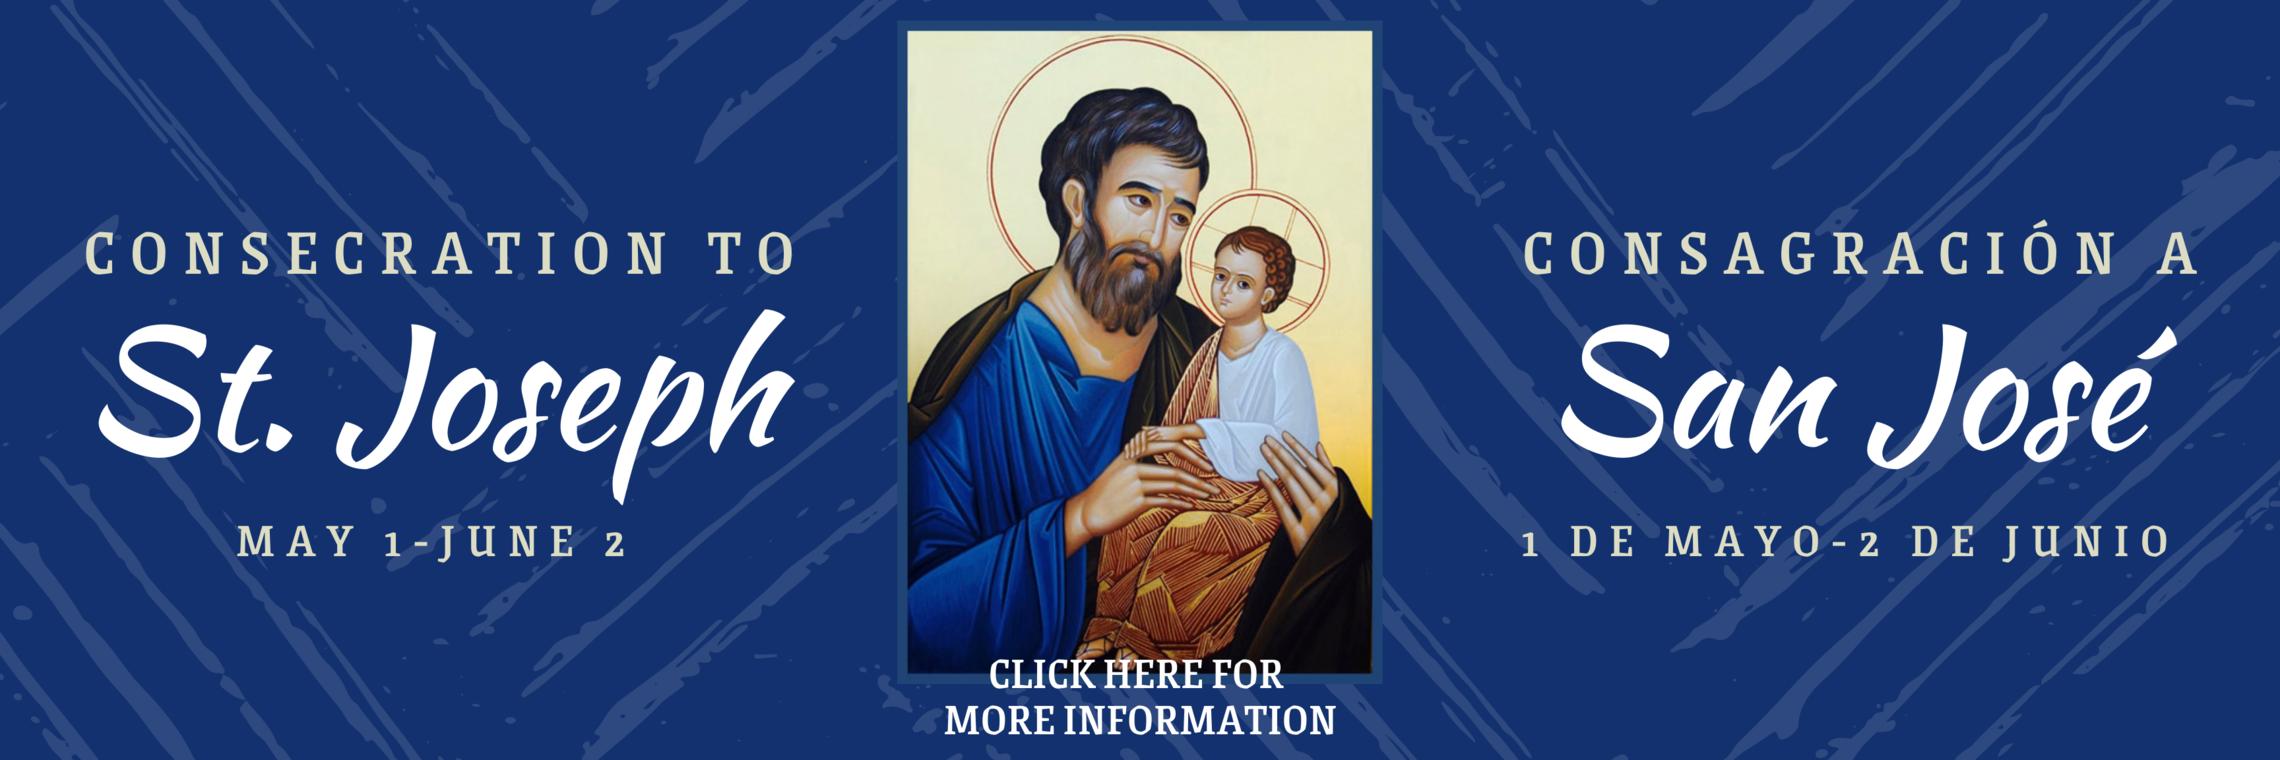 St. Joseph Consecration Web